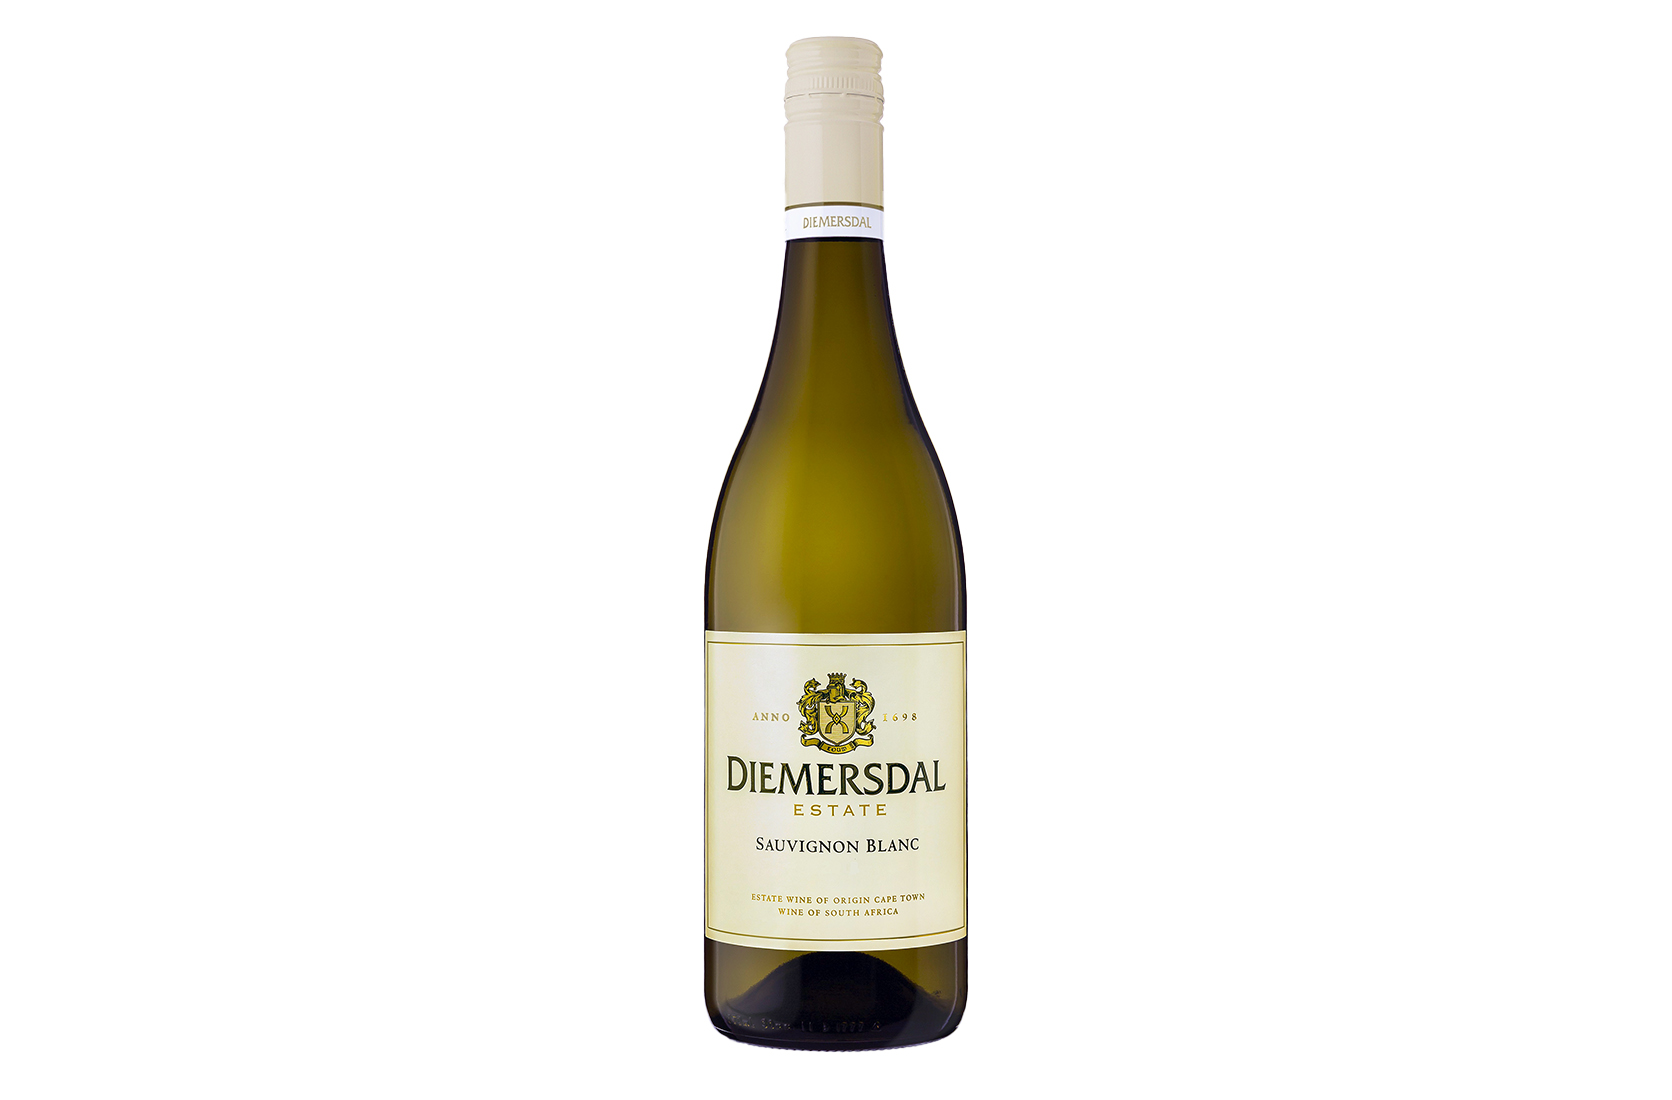 Diemersdal Sauvignon Blanc 2020/2021